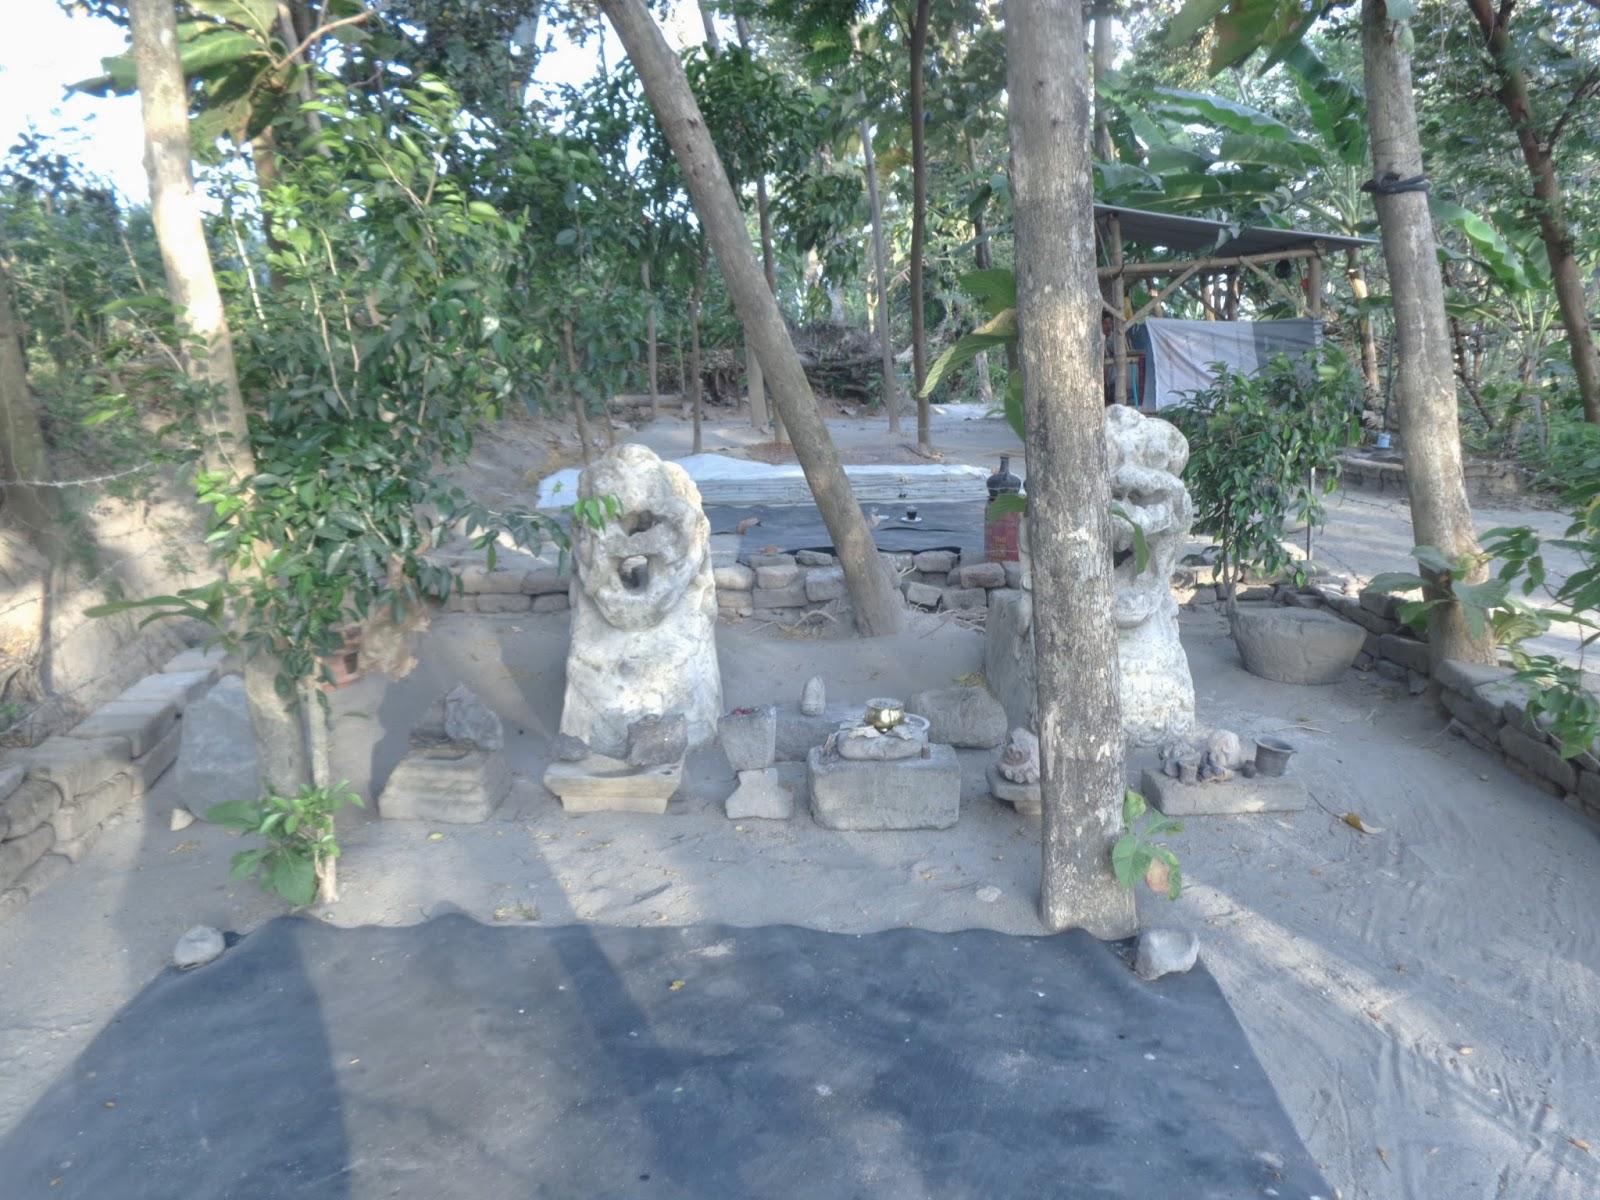 Wisata Spiritual Area Kediri Situs Semen Kab Jawa Pagu Ditemukan